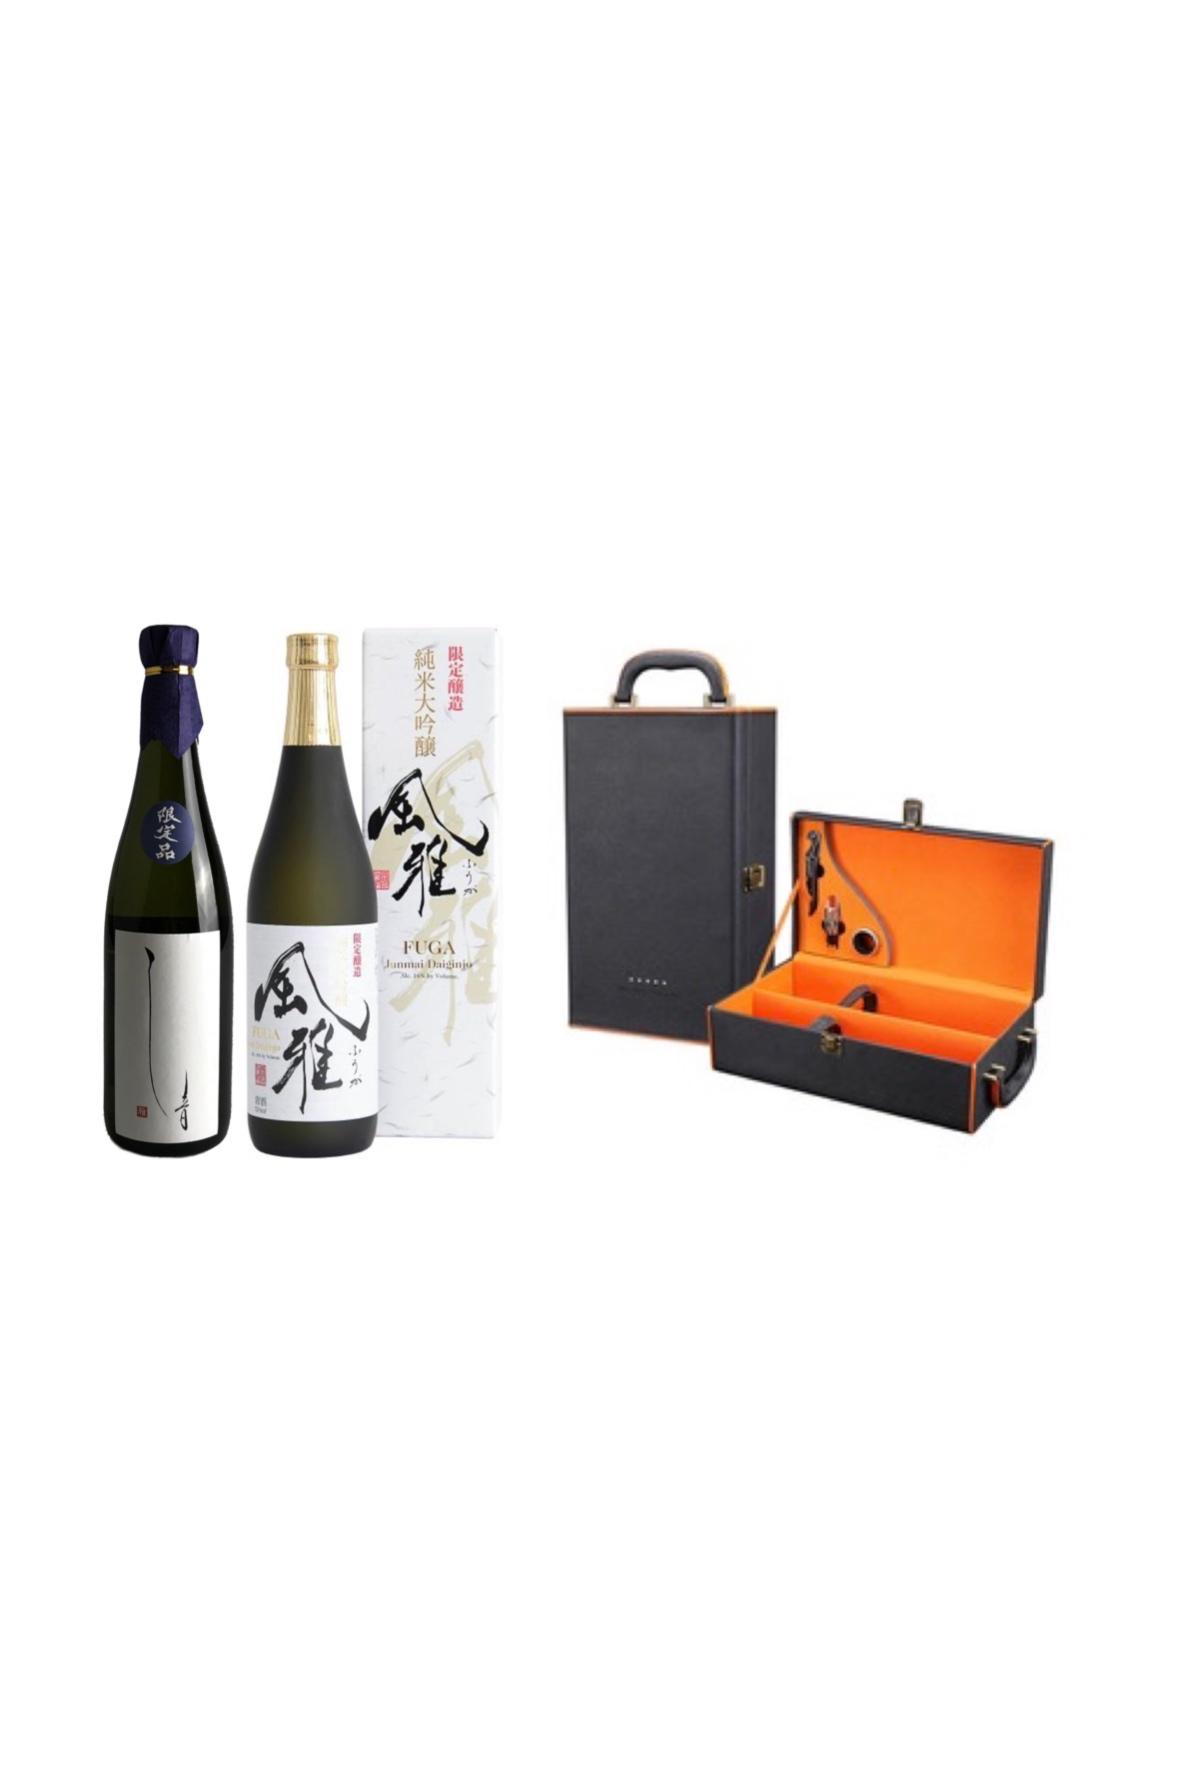 1 Month Sake Indulgence Wine Gift Subscription